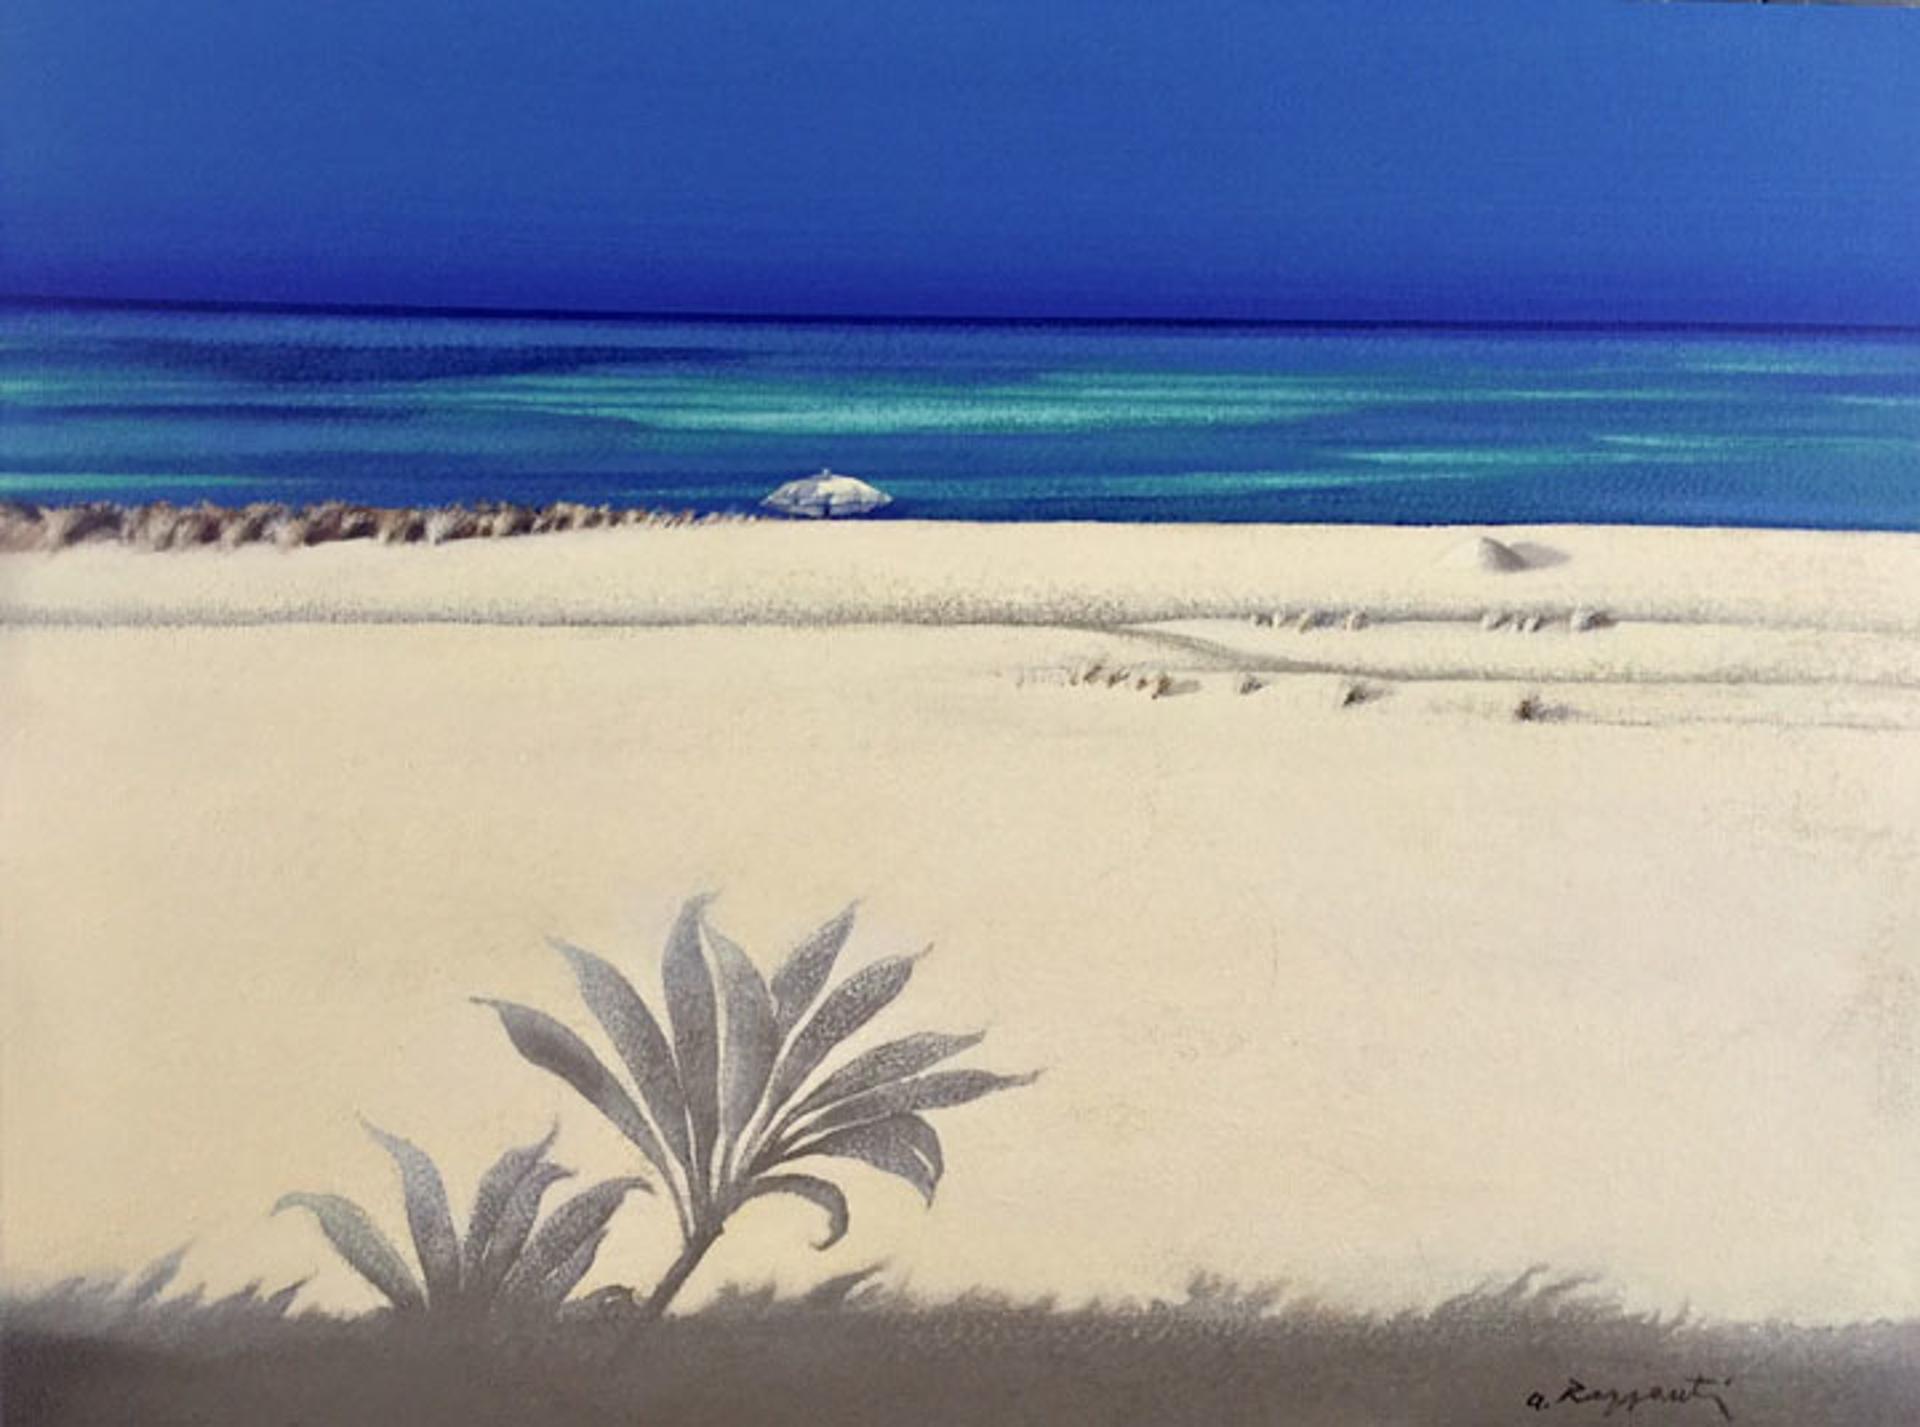 White Sand With Ti Leaf by Andrea Razzauti